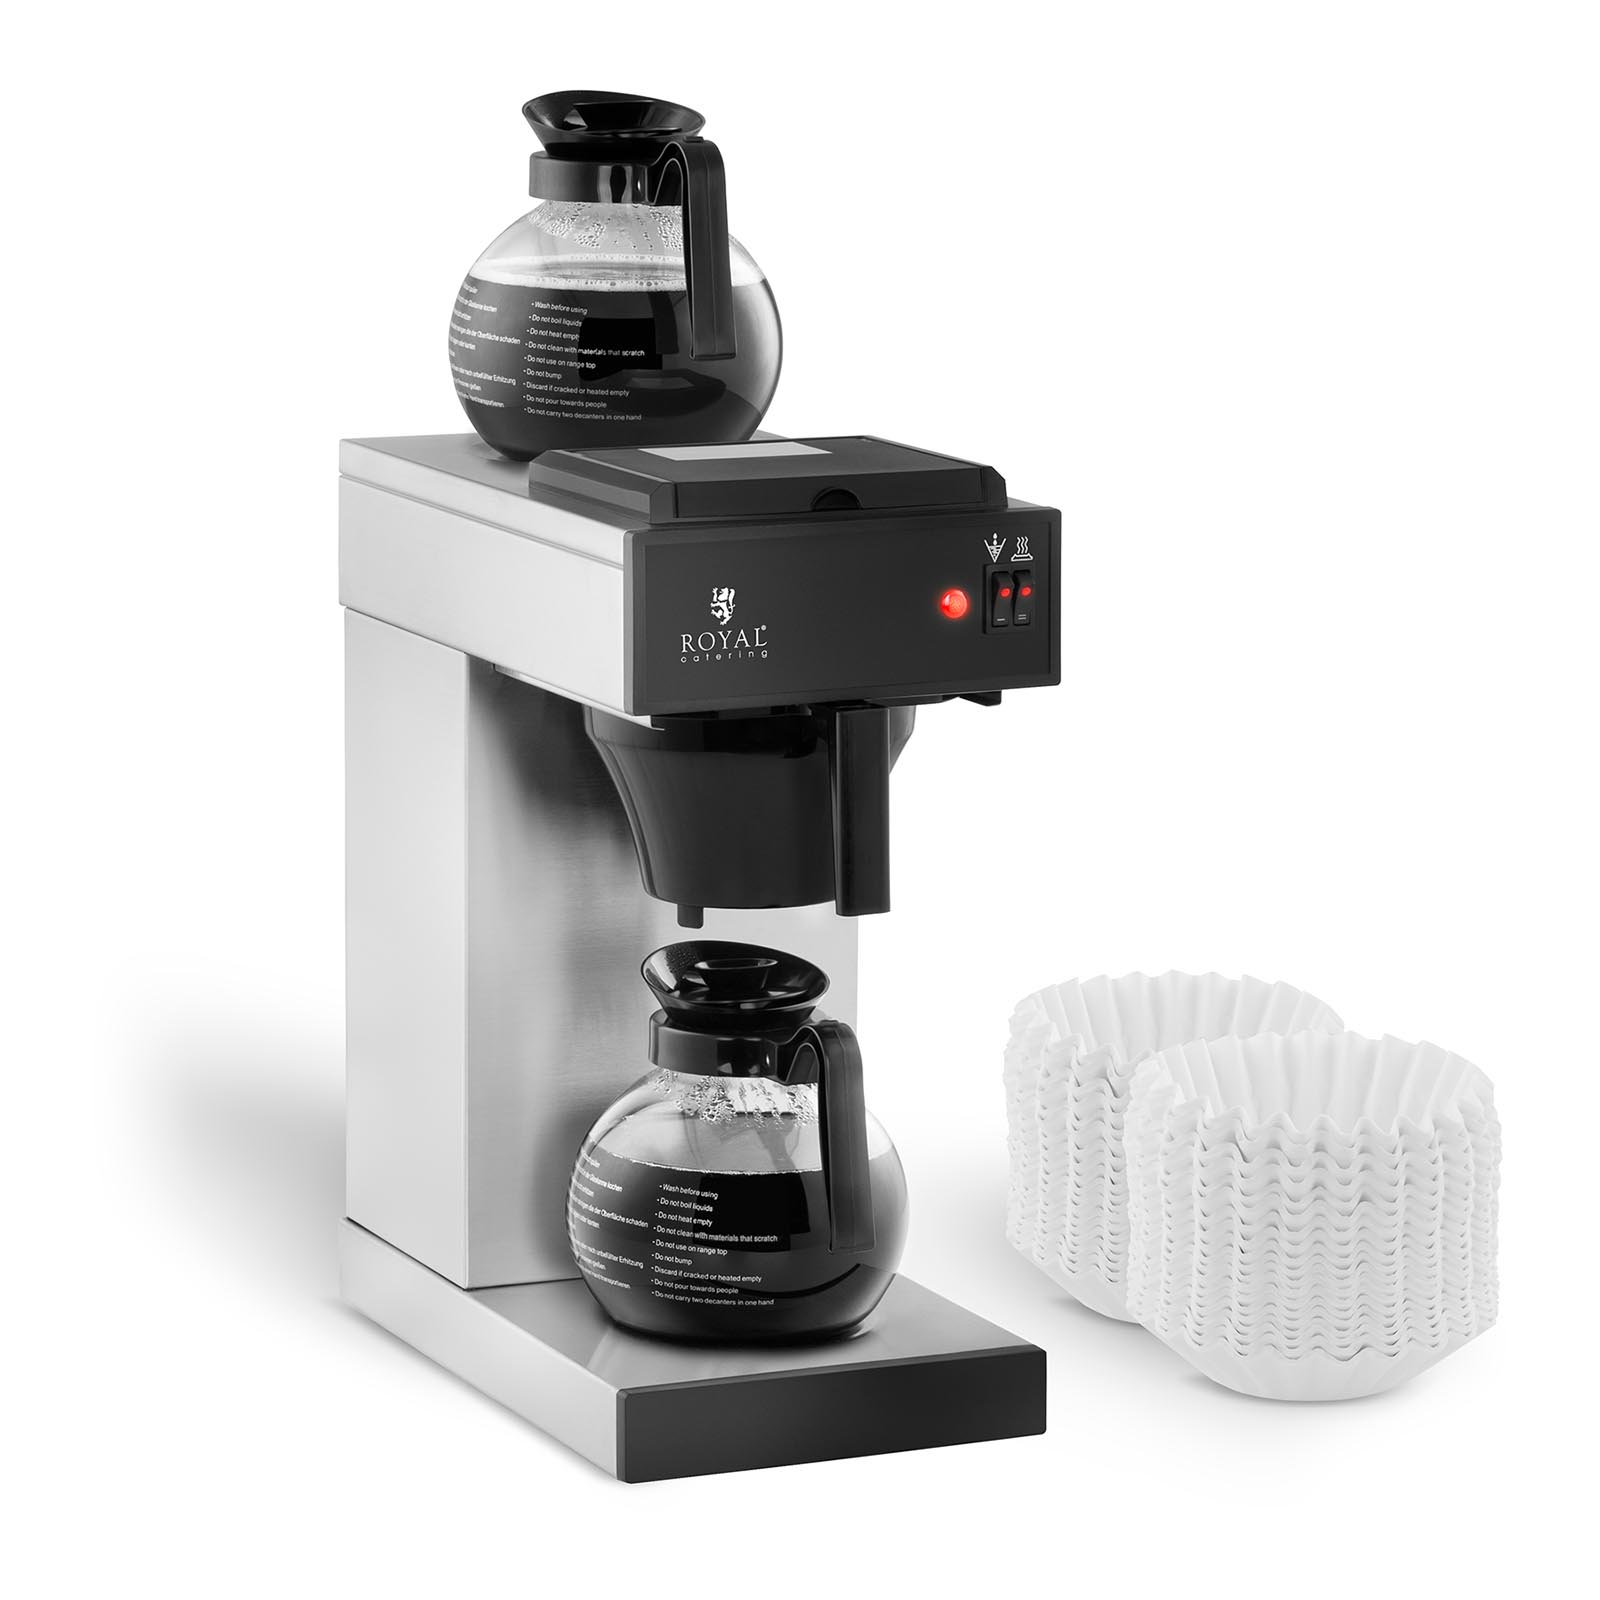 royal catering kaffeemaschine inkl 2 kaffeekannen 2x2 liter kaffeezubereiter ebay. Black Bedroom Furniture Sets. Home Design Ideas